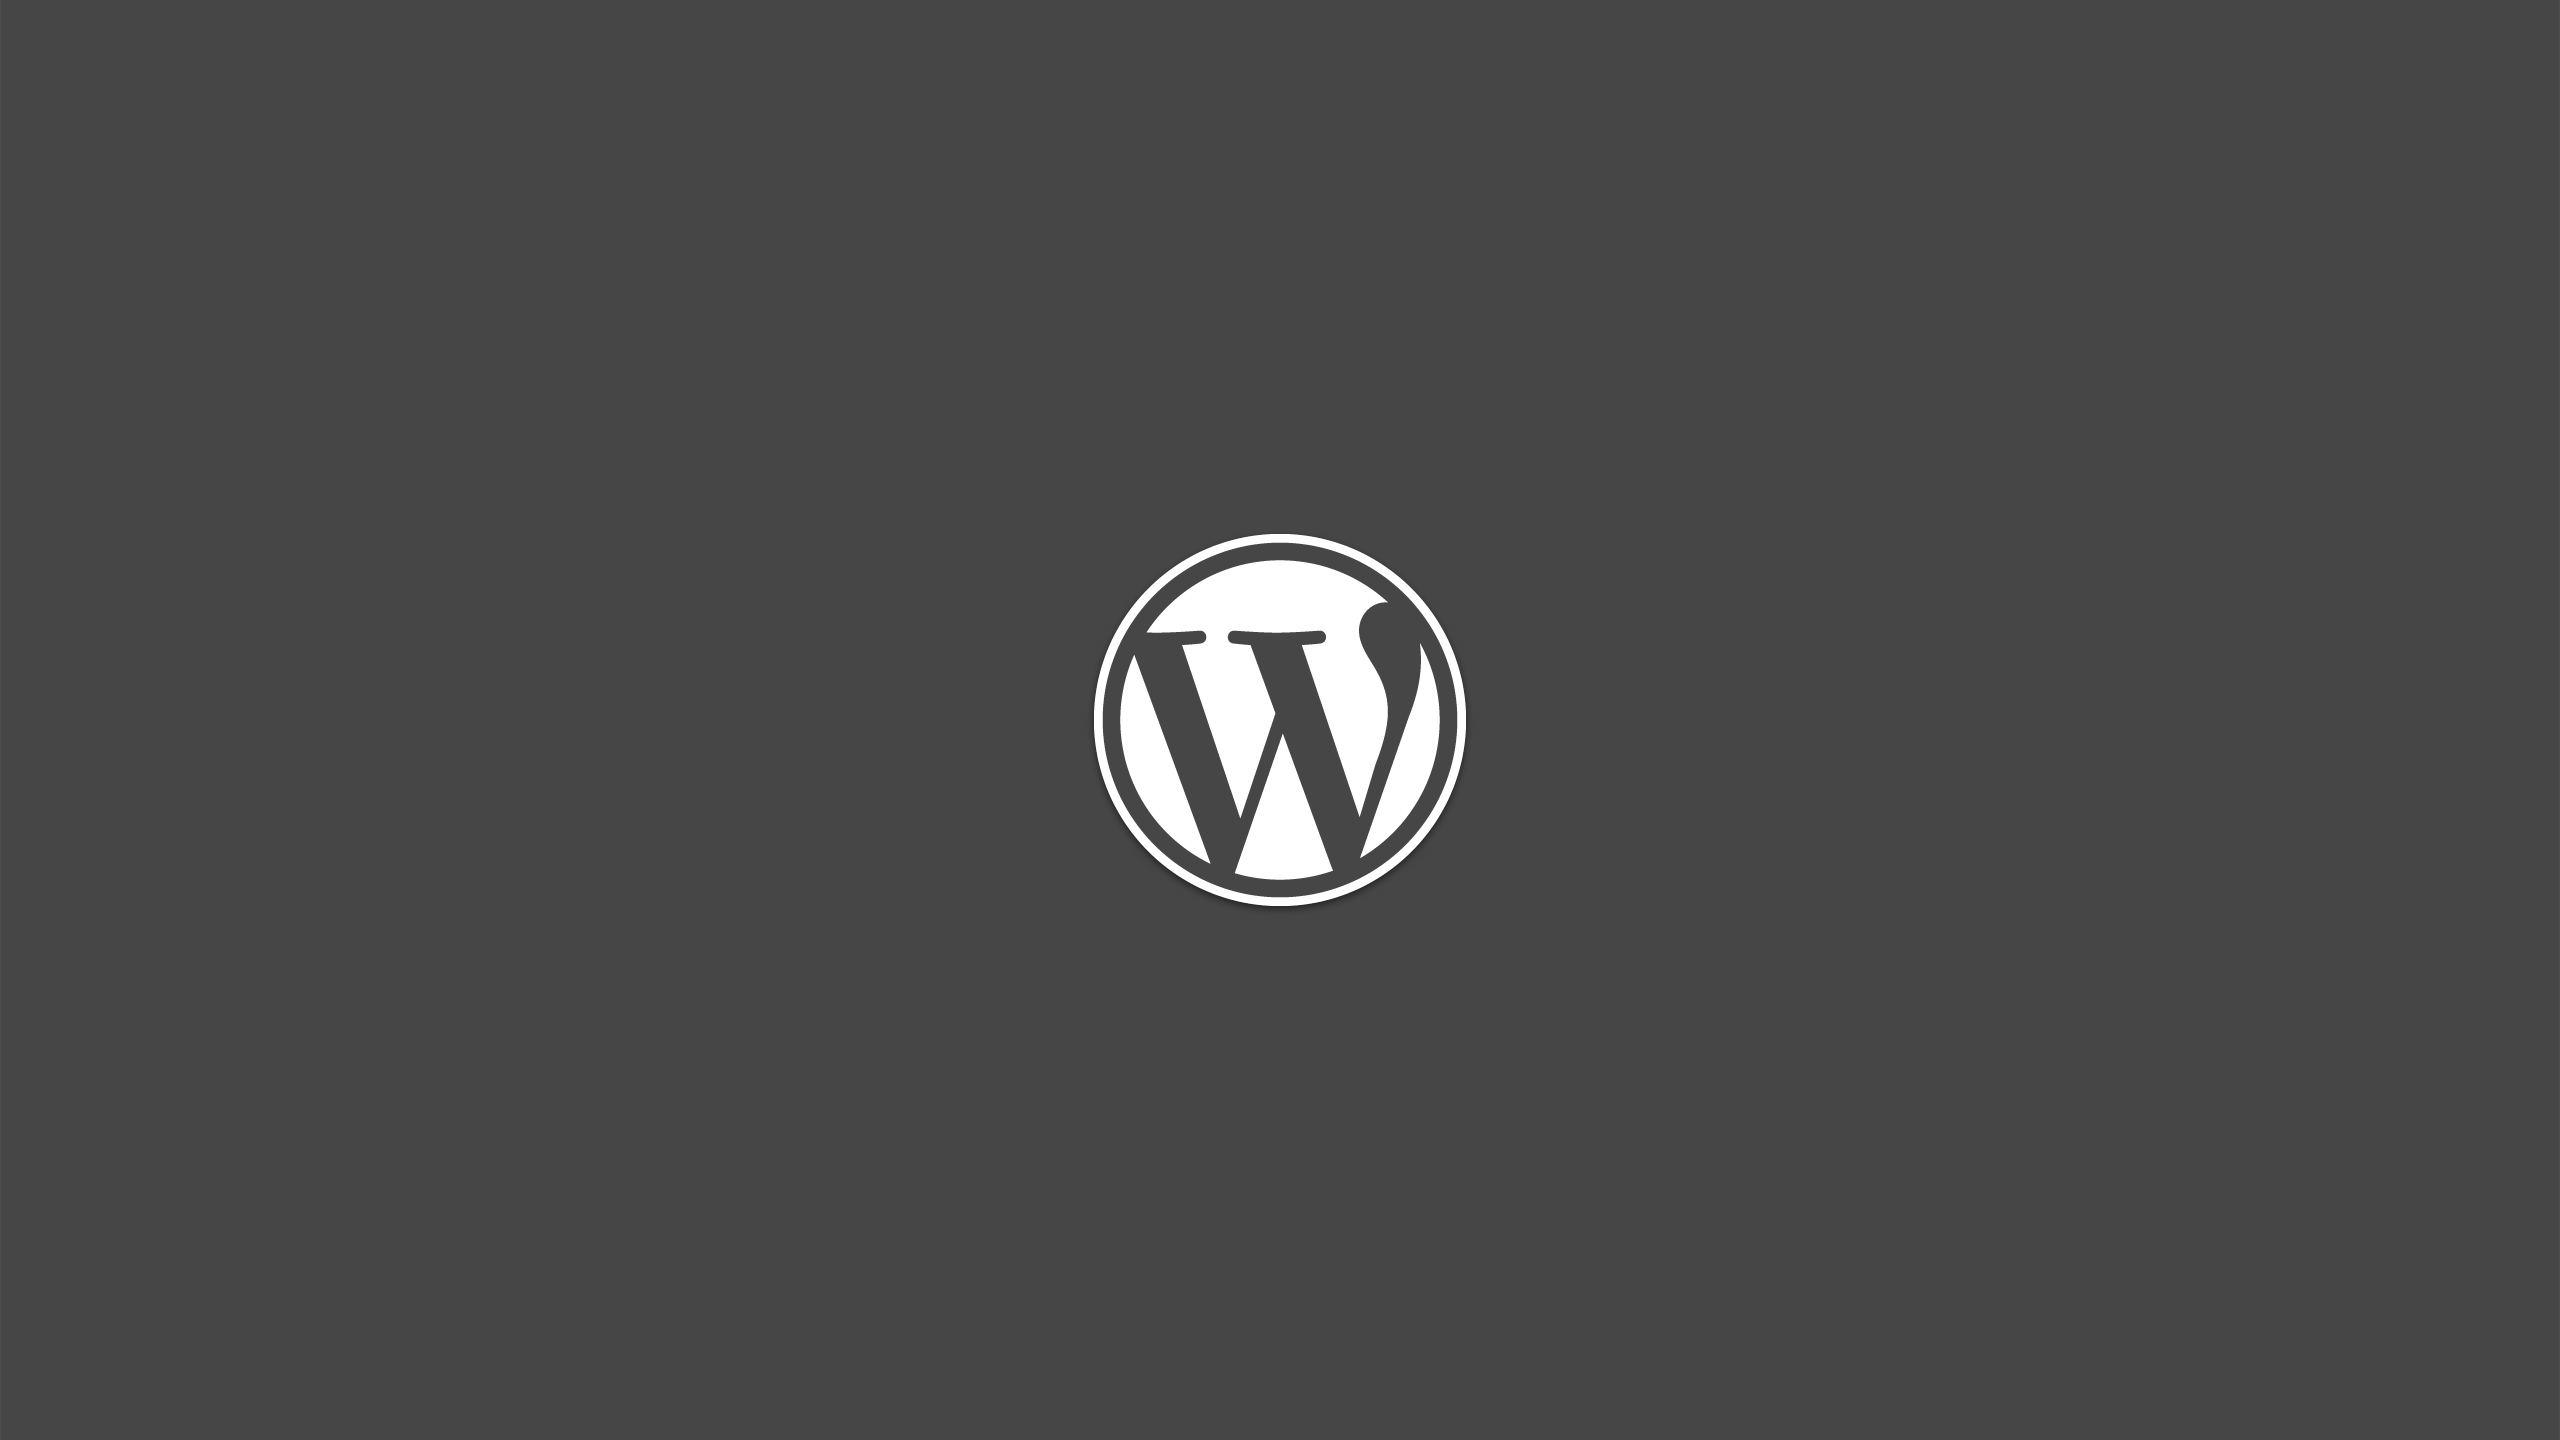 wordpress logo wallpaper background 62786